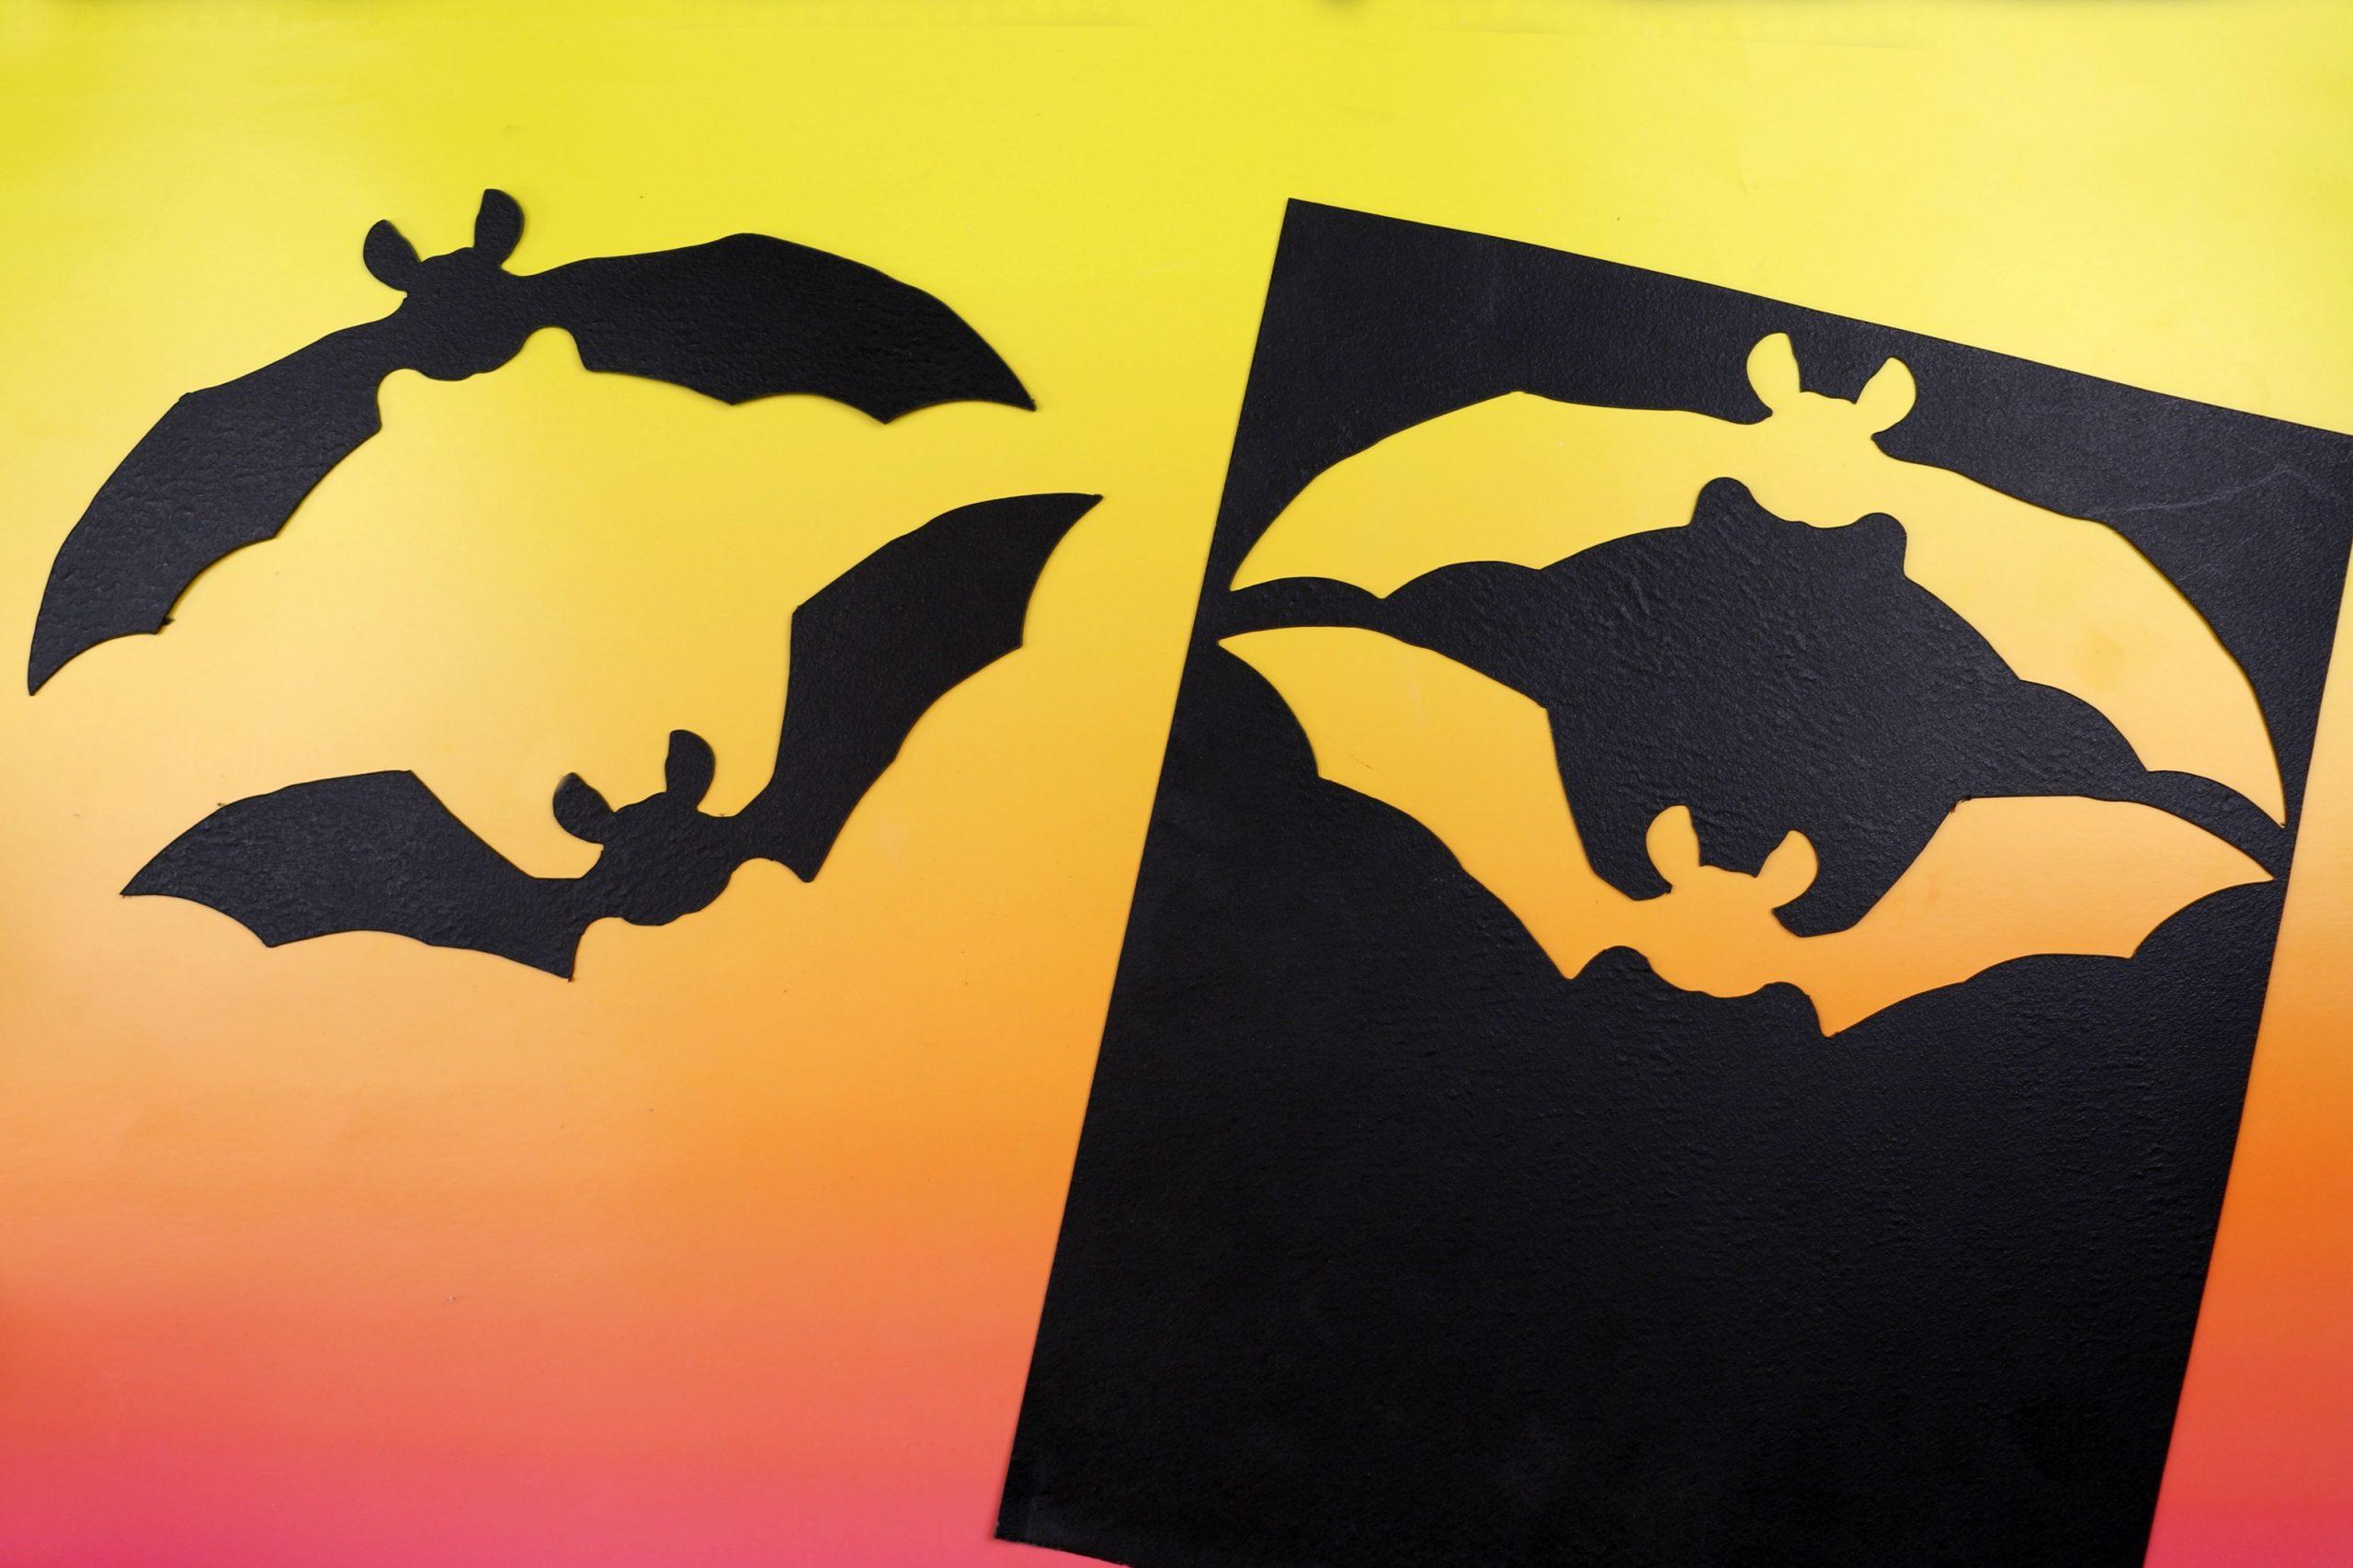 black bat shape cut out of worbla plastic